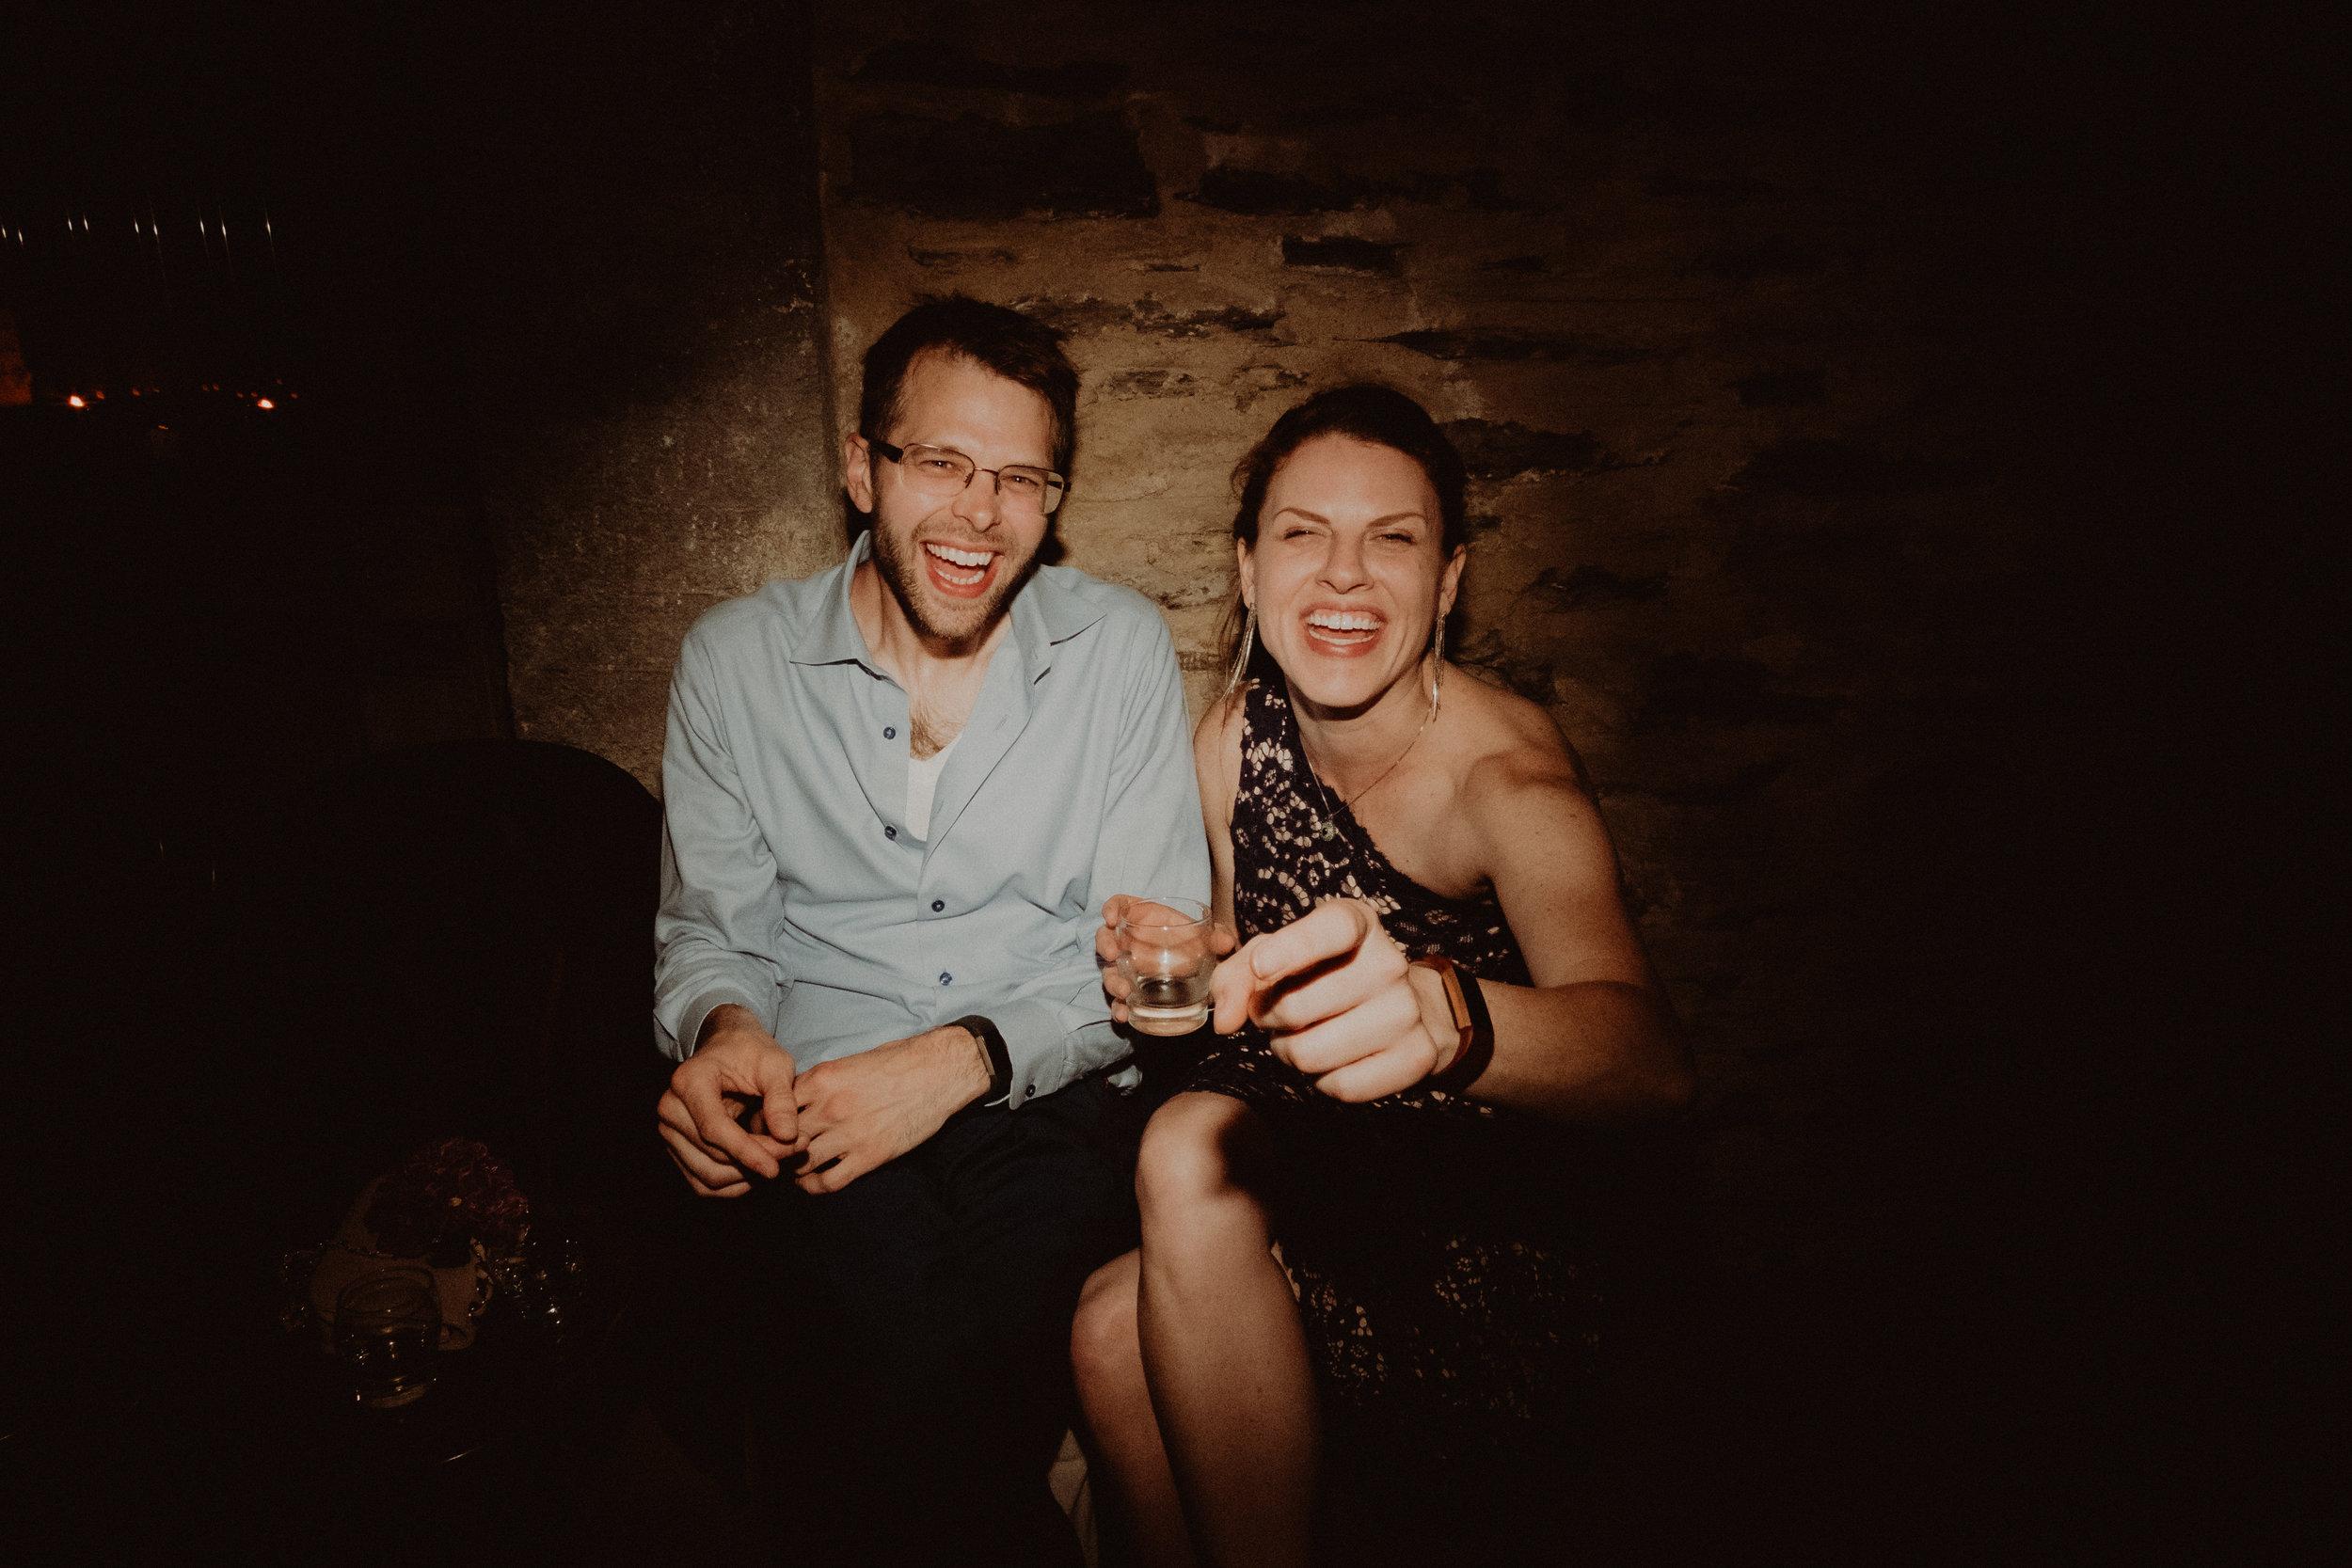 perrigrine wines wedding kseniya and travis chellise michael photography751.JPG